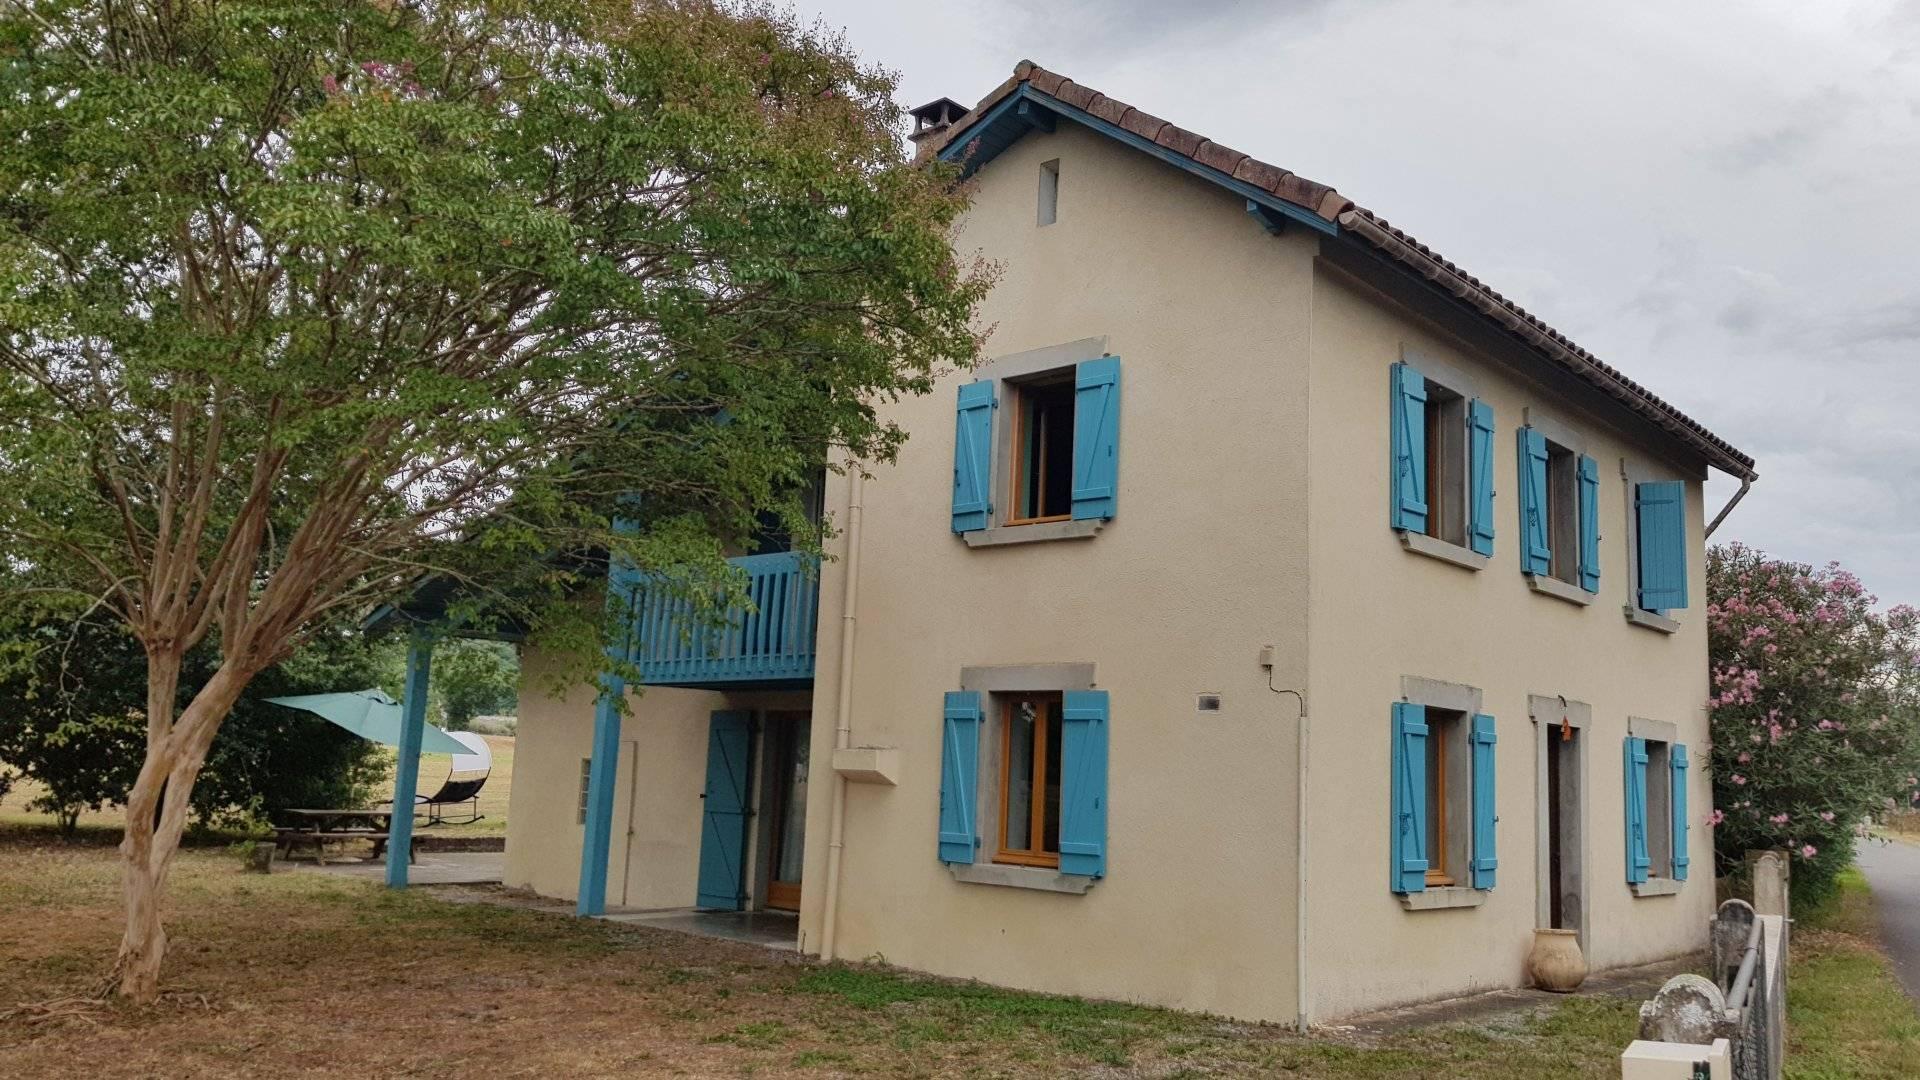 1 18 Saint-Cricq-du-Gave